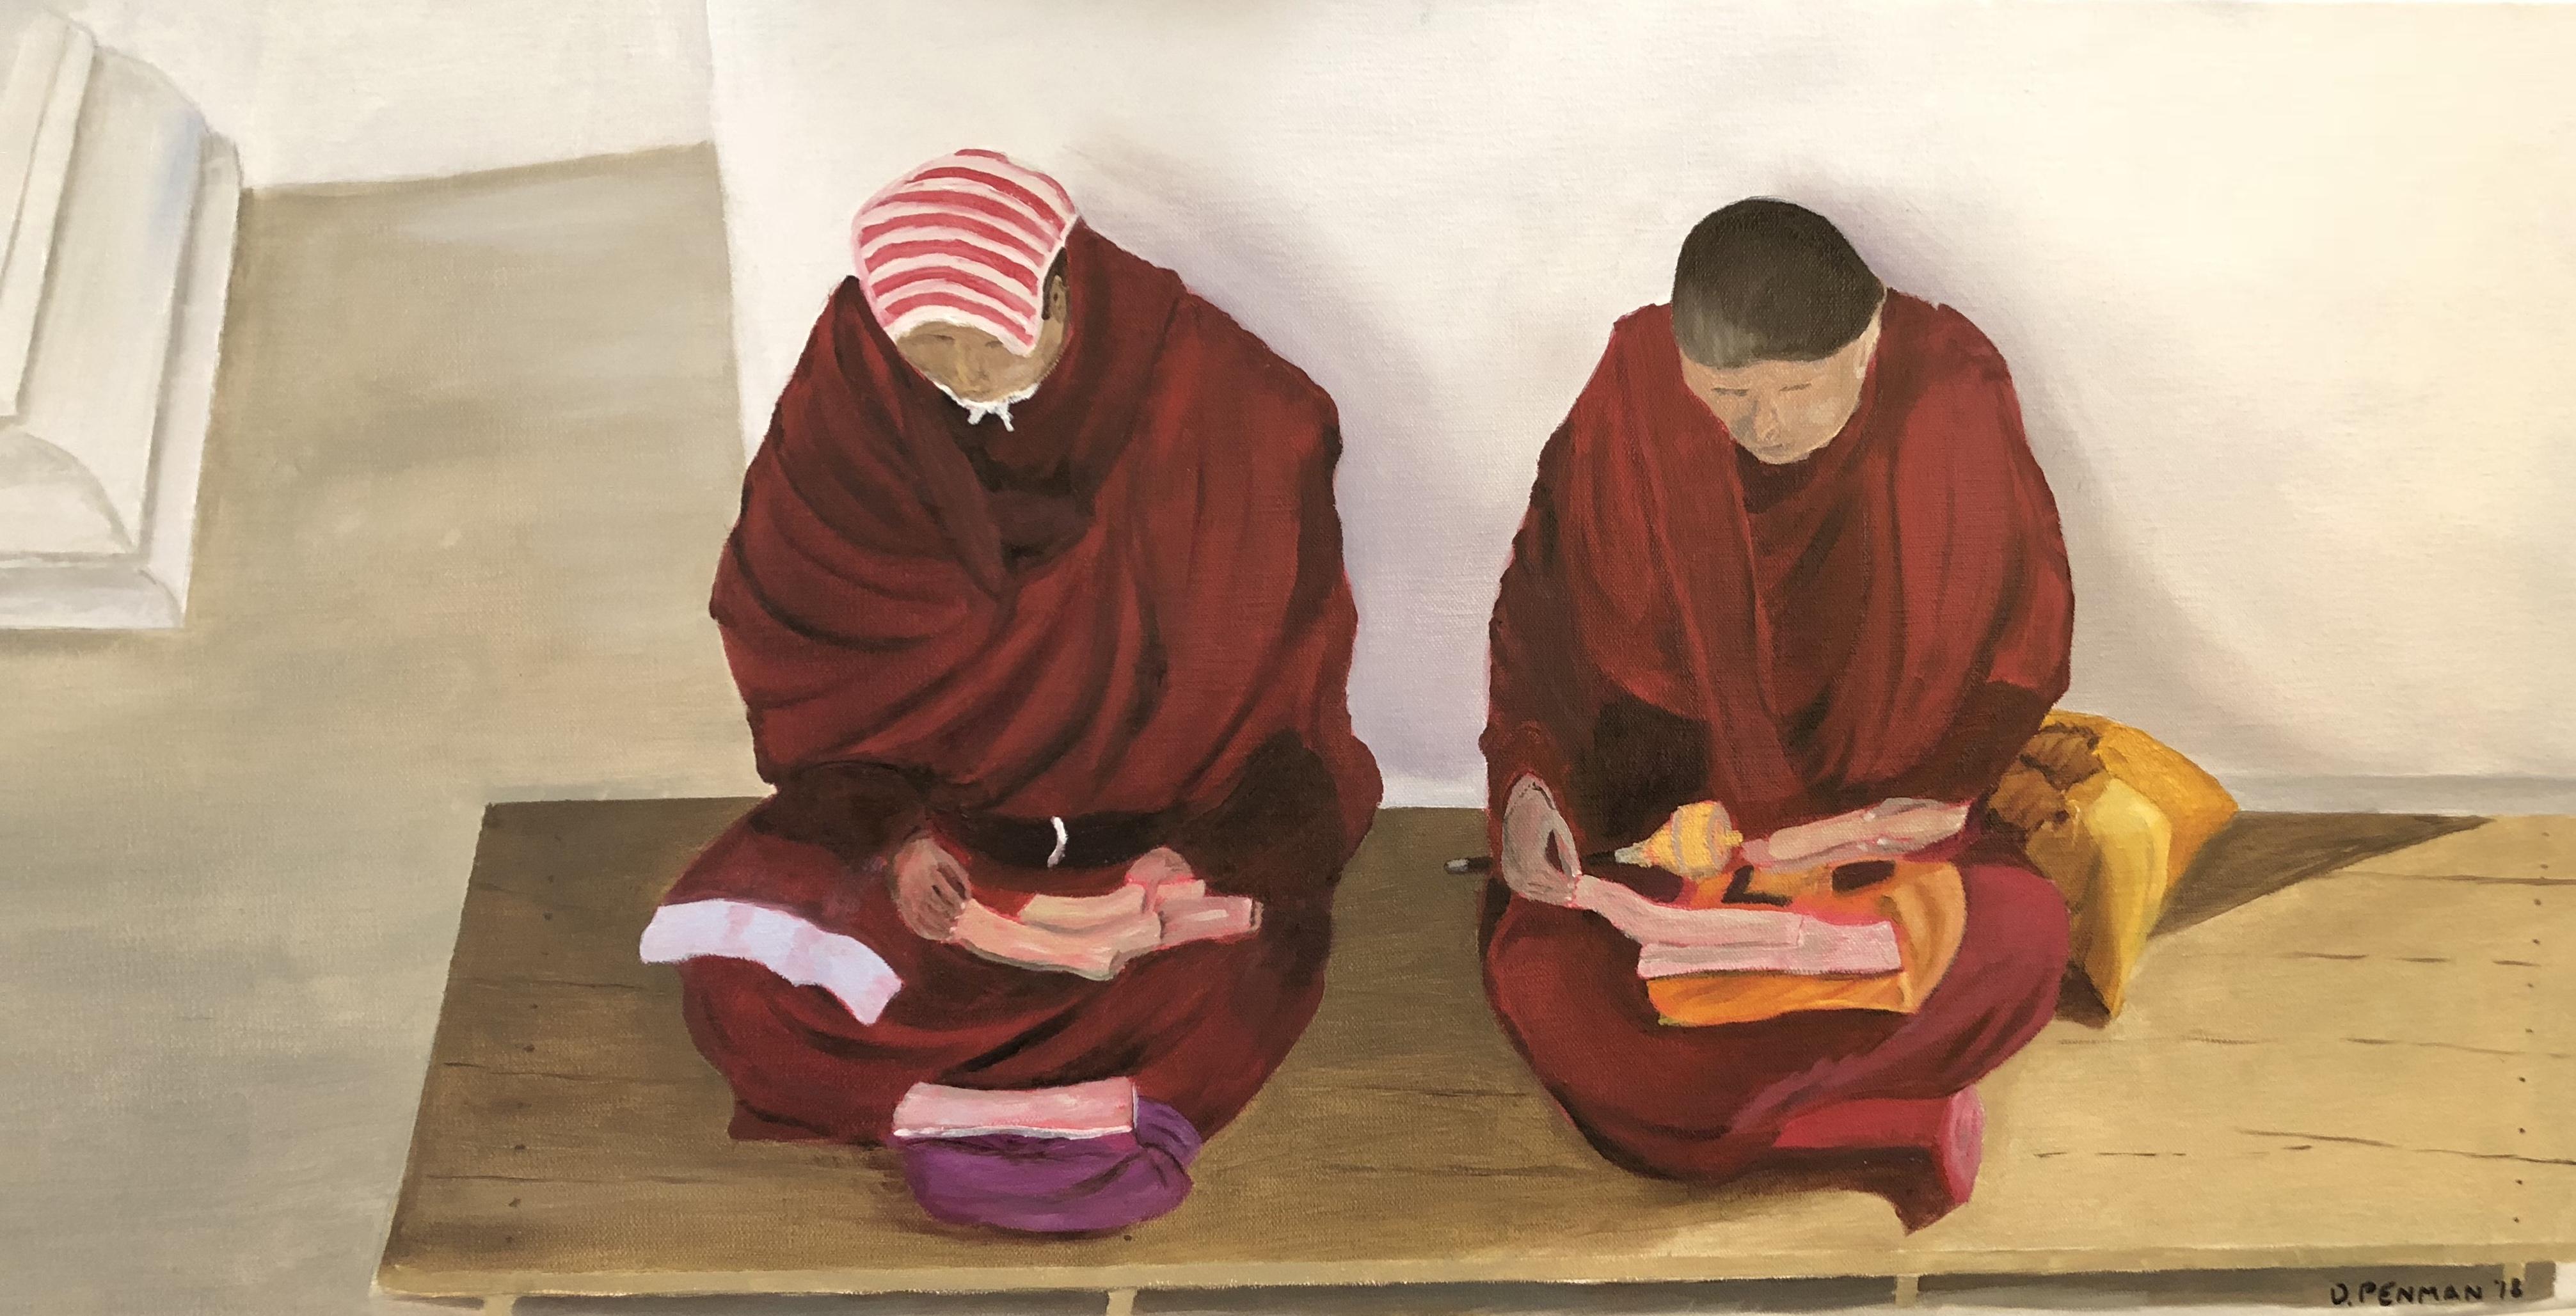 Prayer, Kathmandu